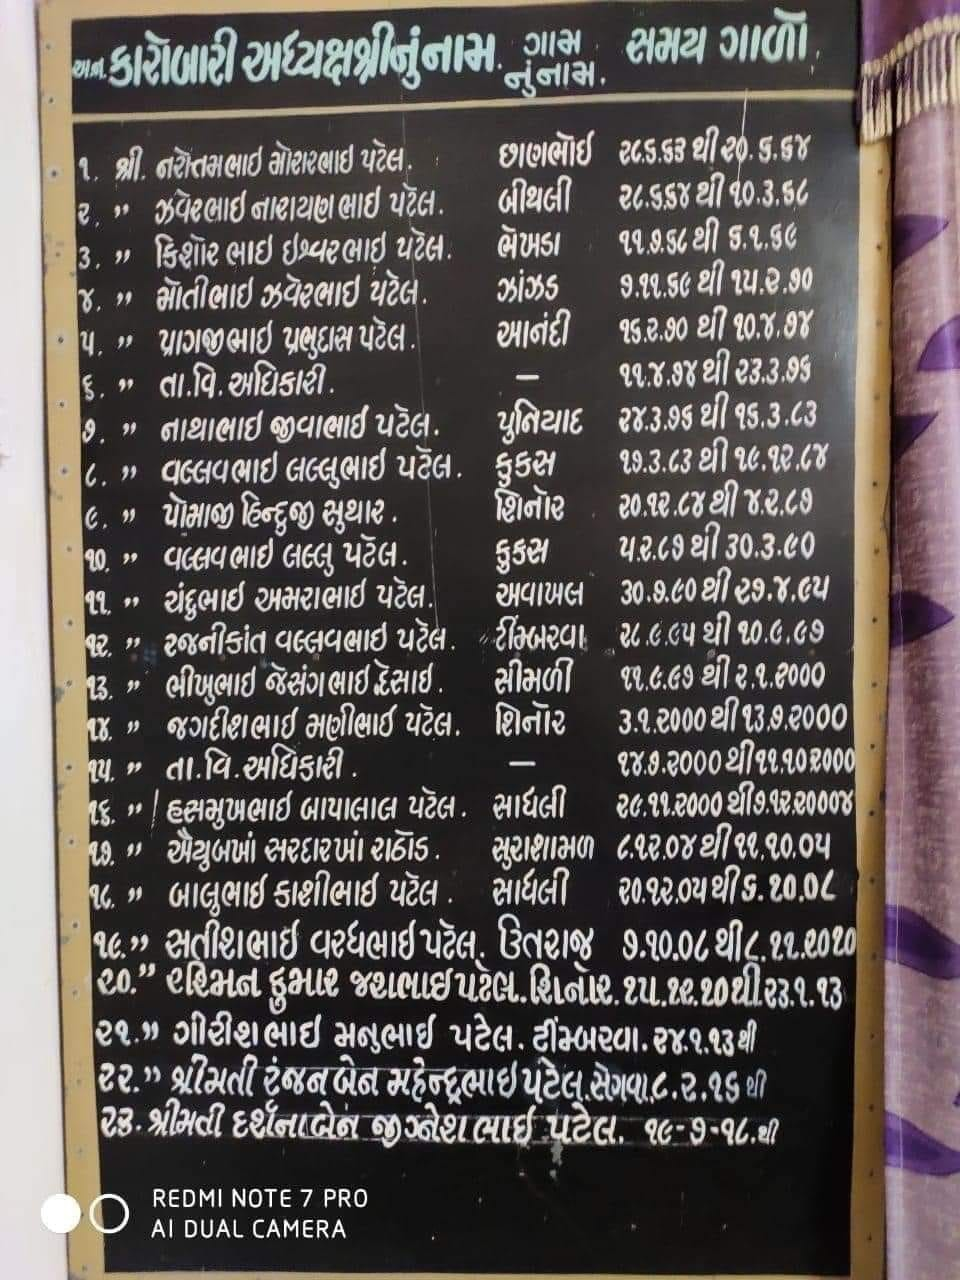 WhatsApp Image 2020 10 28 at 3.33.06 PM » Trishul News Gujarati Breaking News